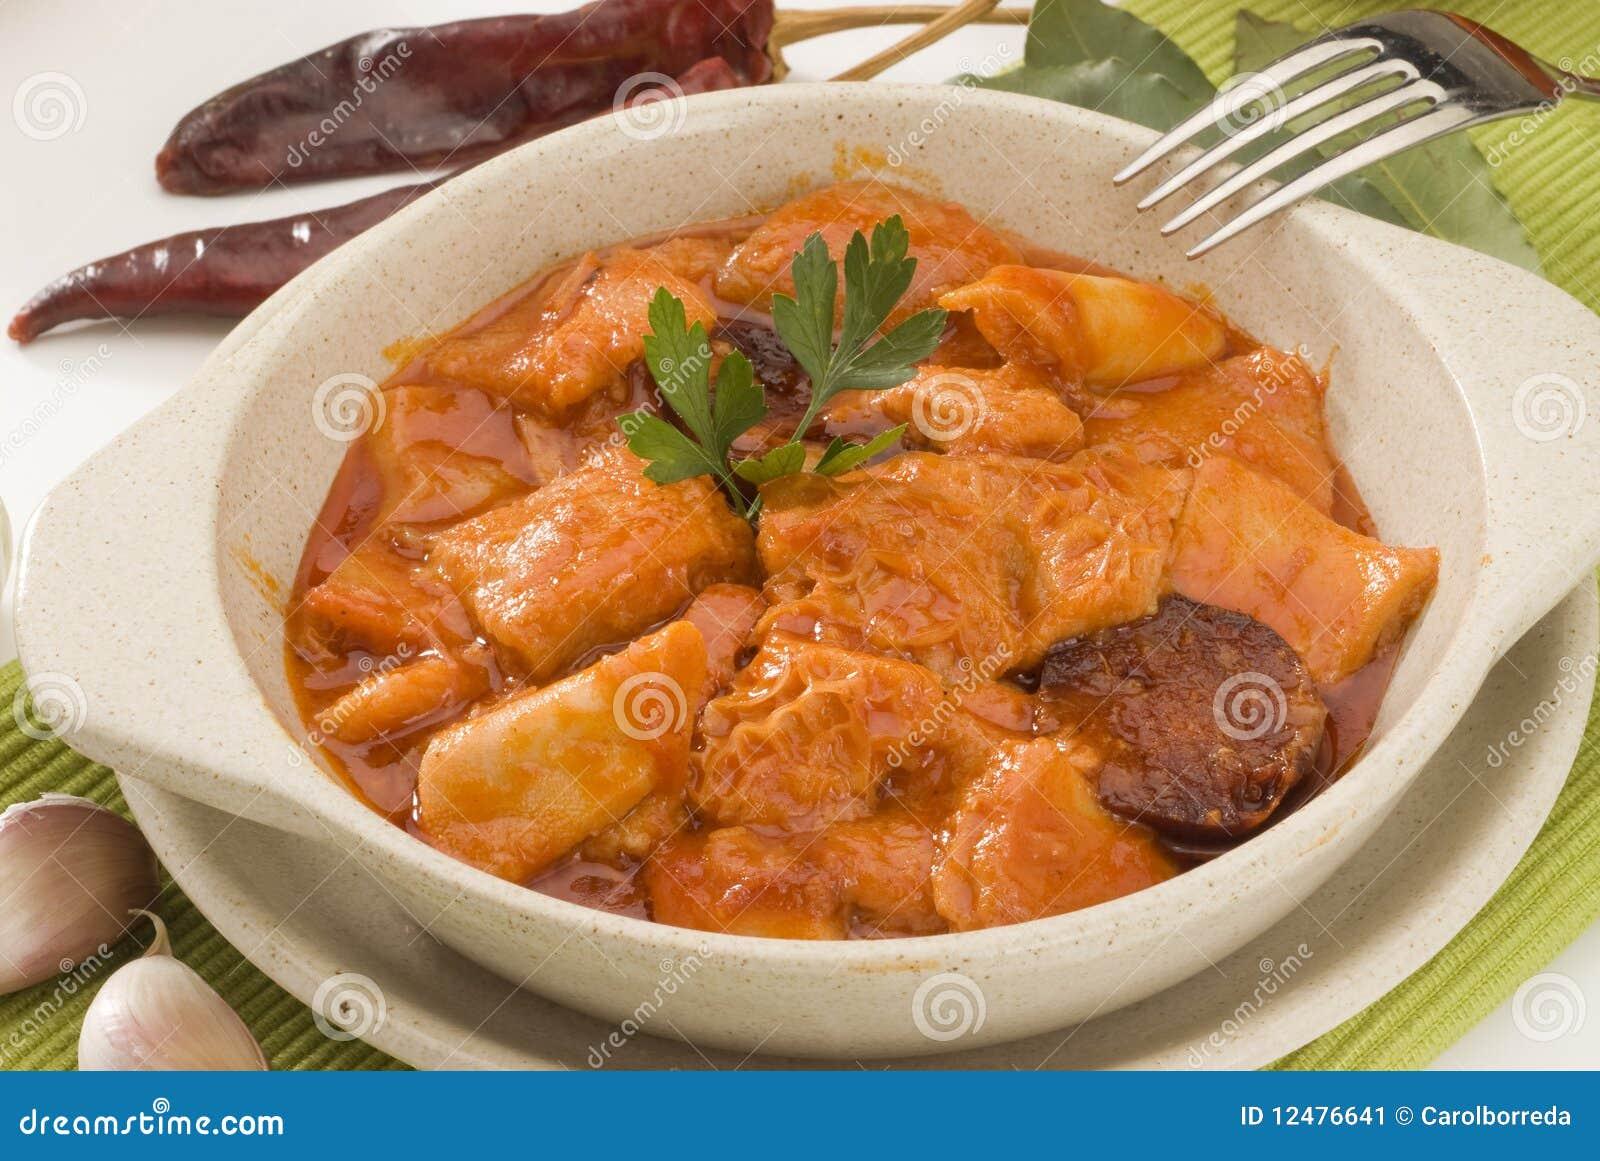 Cucina spagnola trippa stufata porcile di madrid for Cucina spagnola